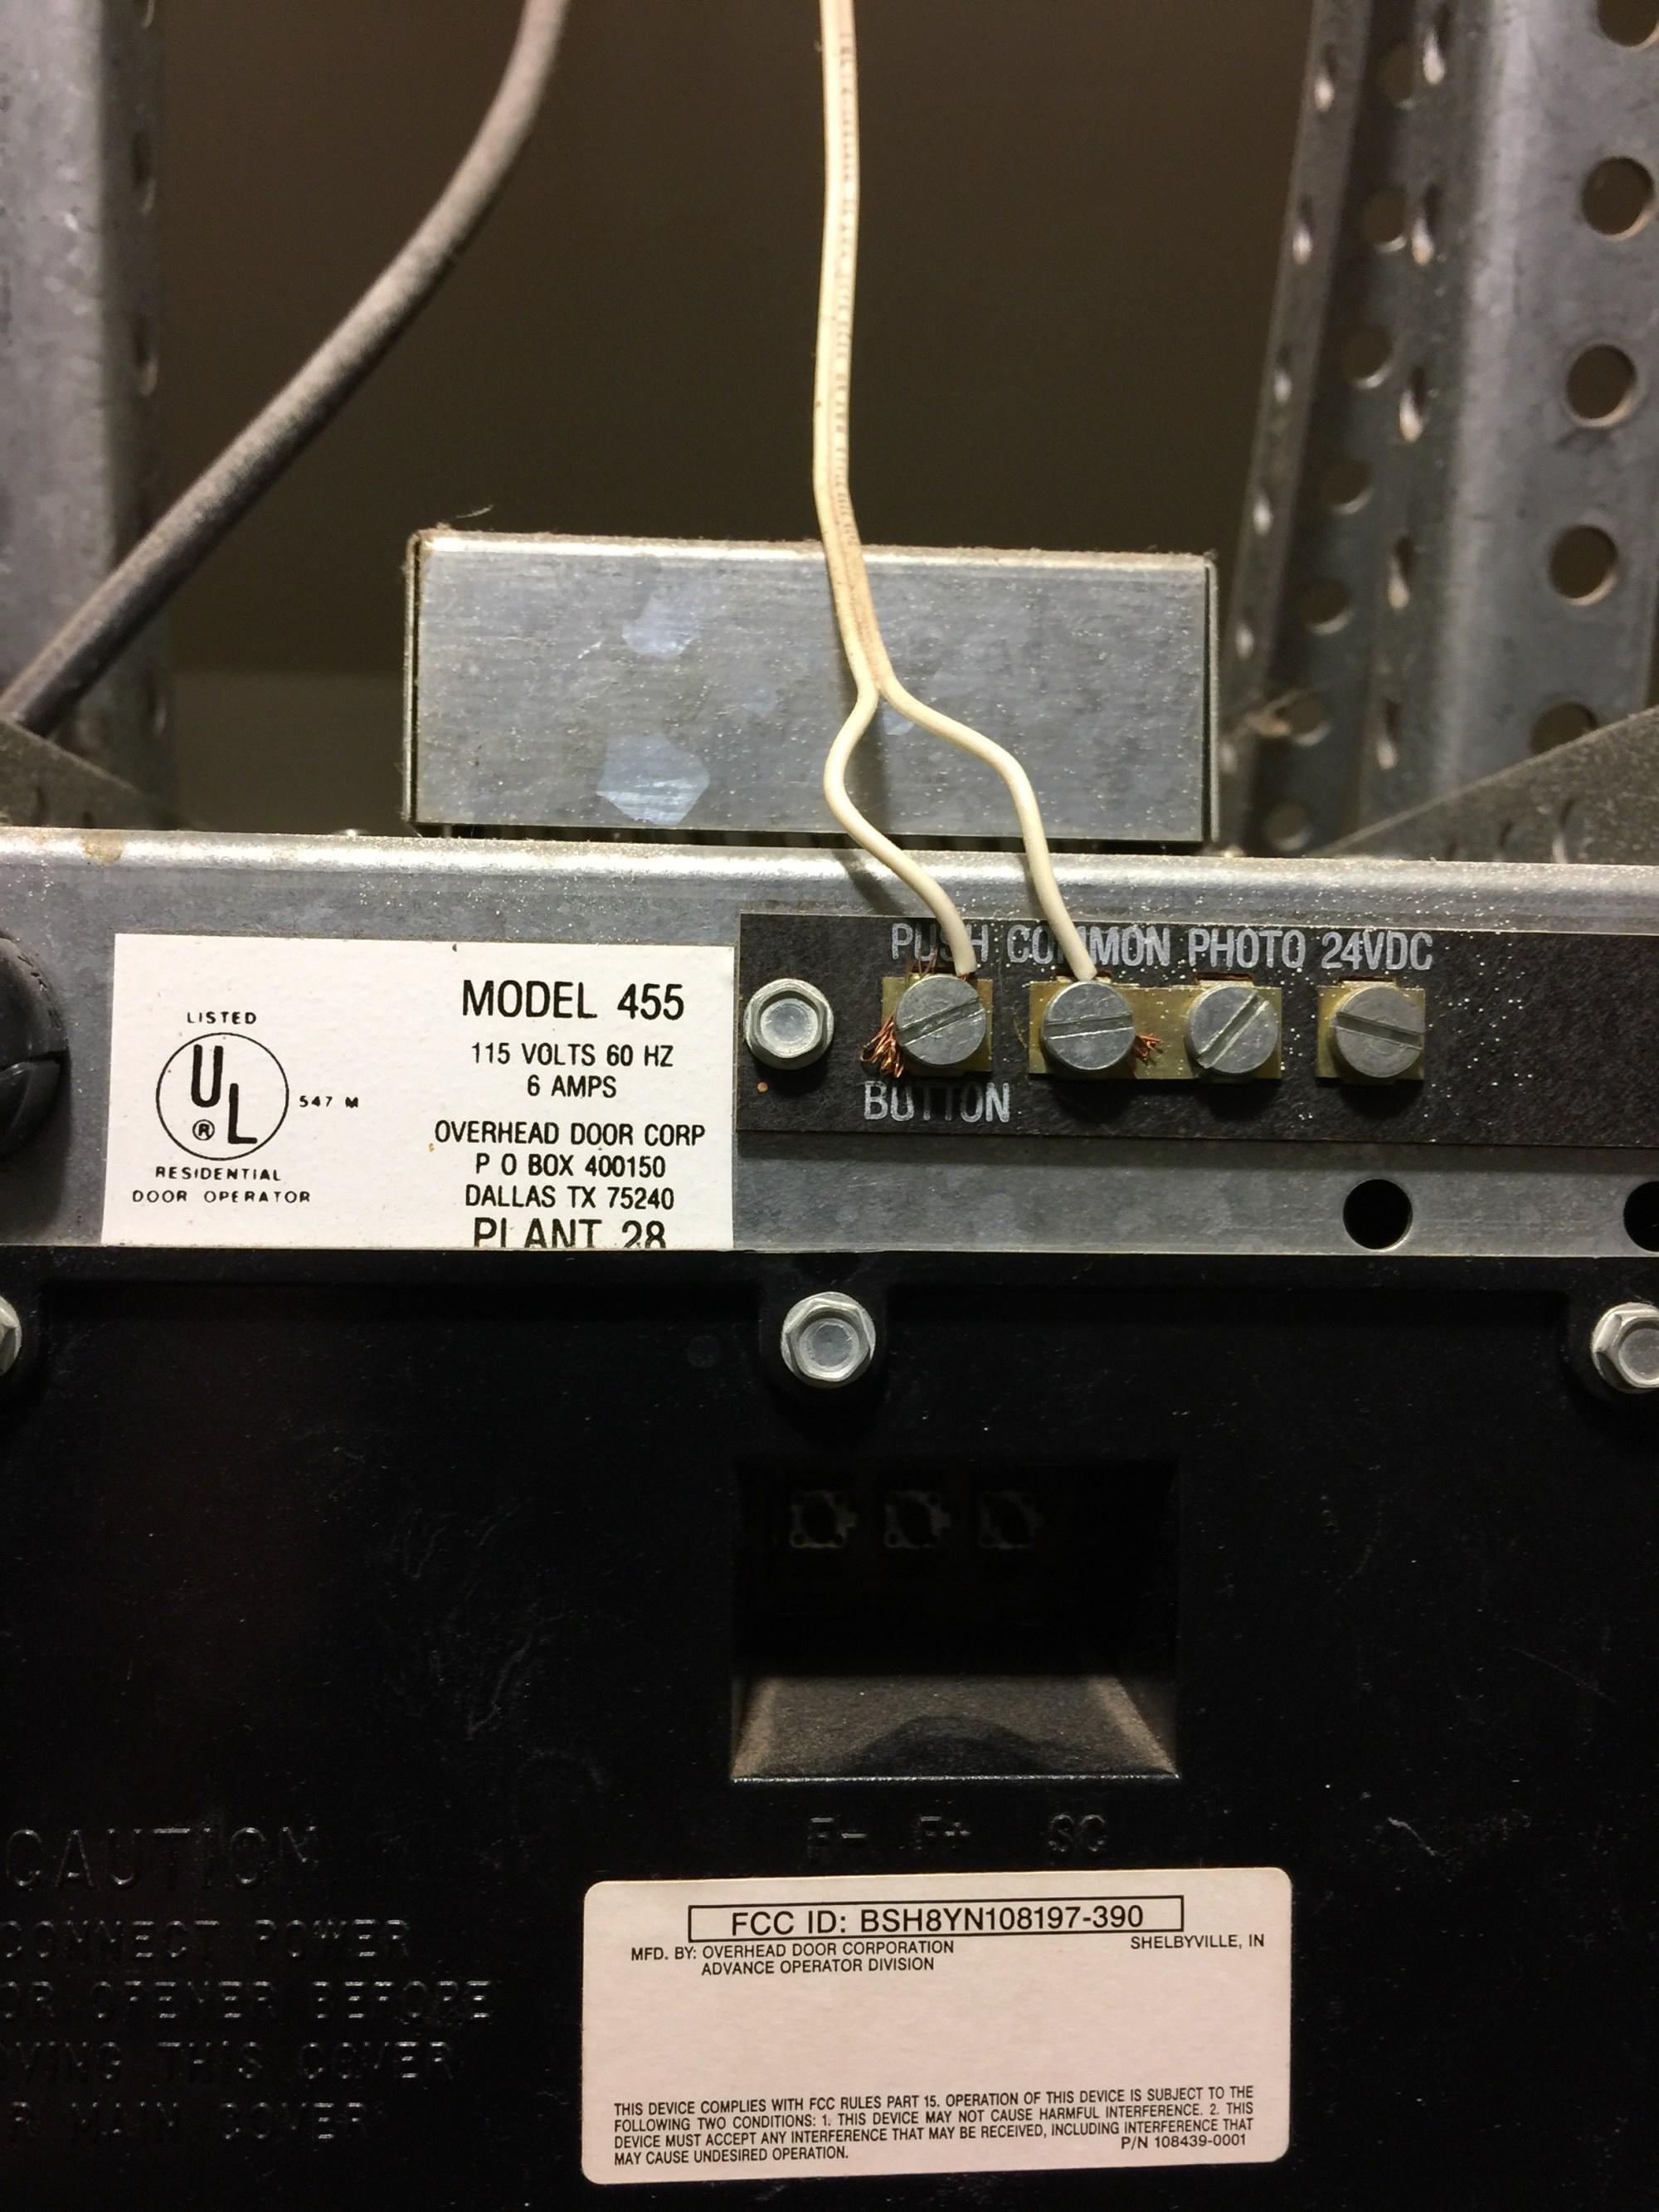 hight resolution of i have a overhead door corp model 455 opener